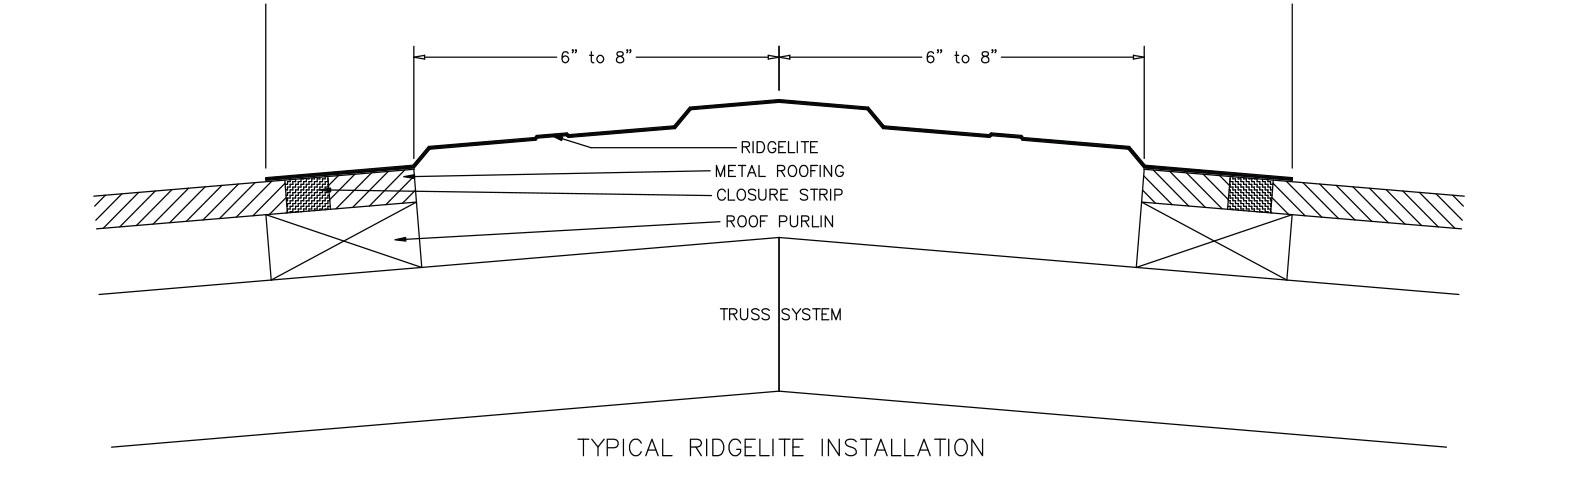 Polycarbonate - Ridgecap